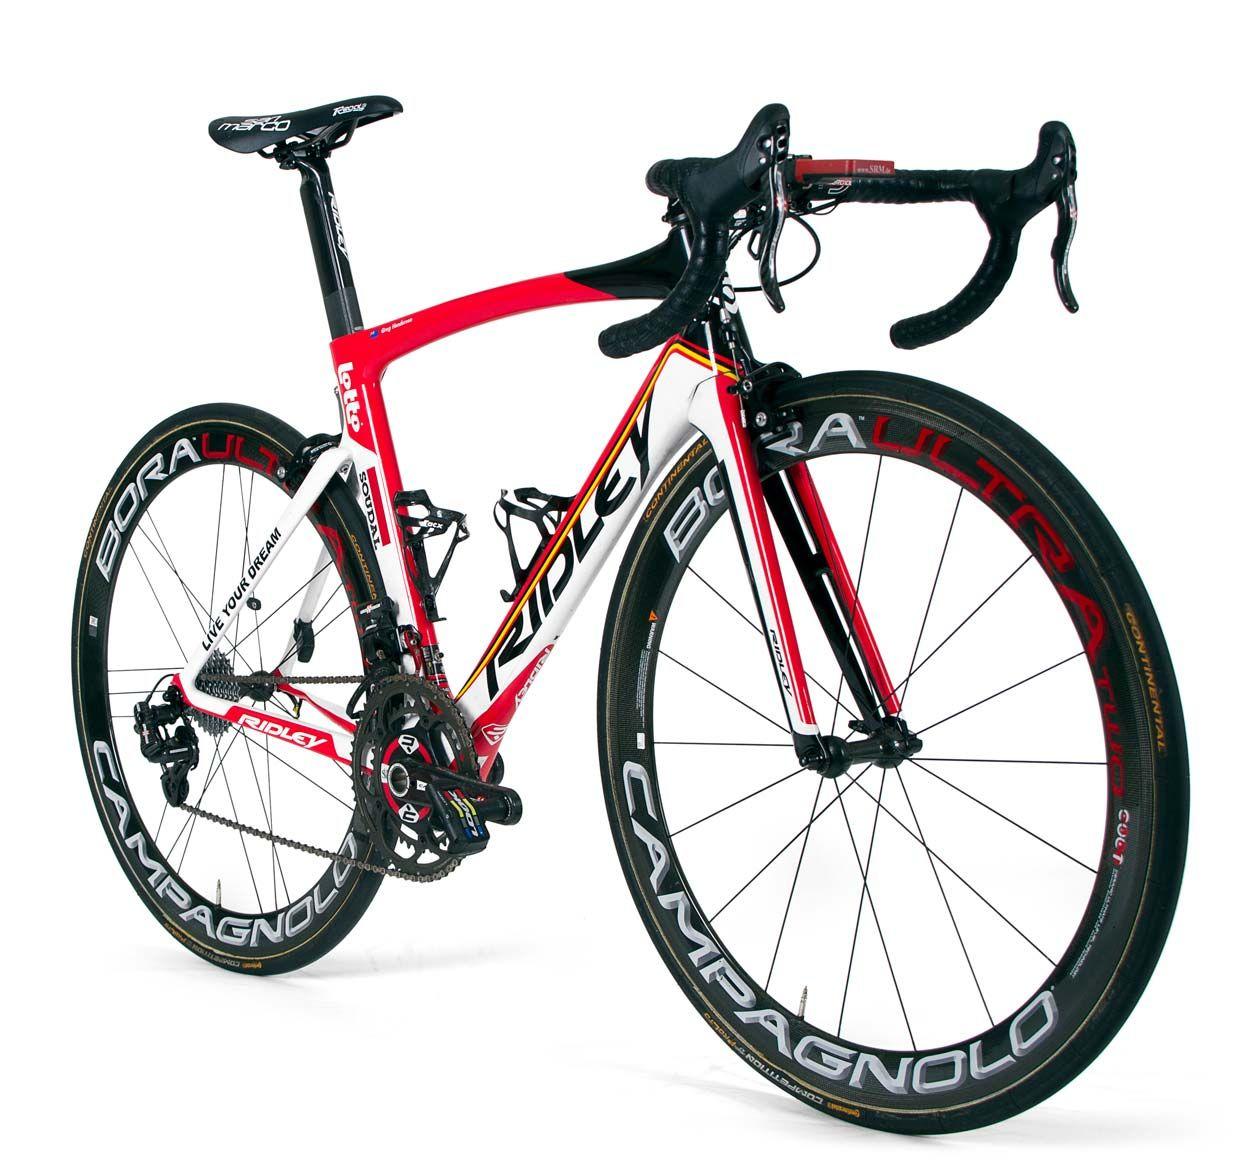 Team bike gallery – Lotto-Soudal of Ridley | Pinterest